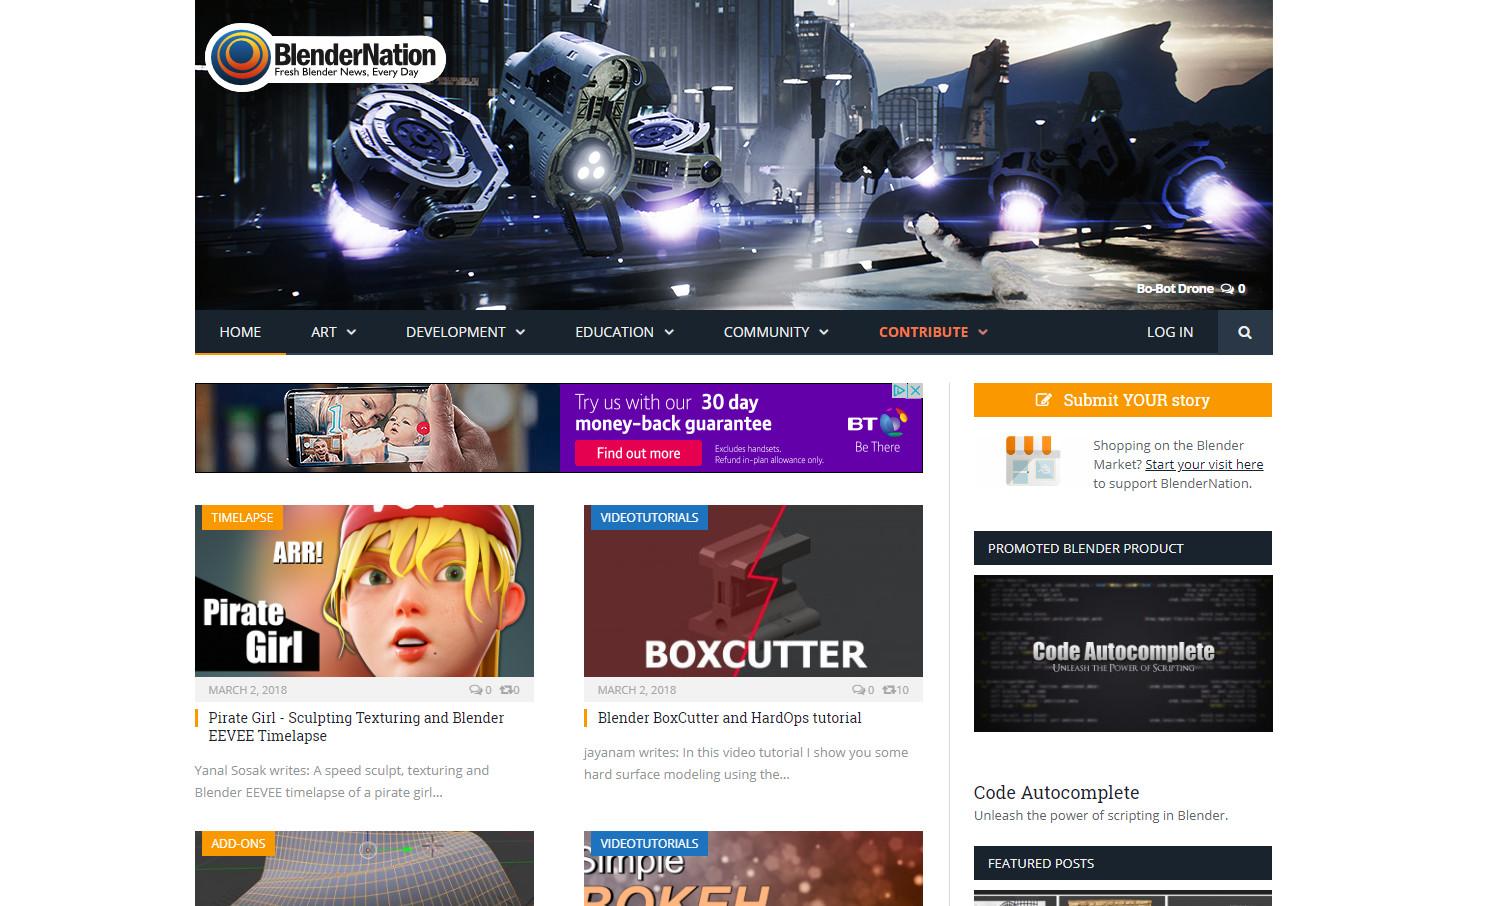 Featured in blendernation.com!